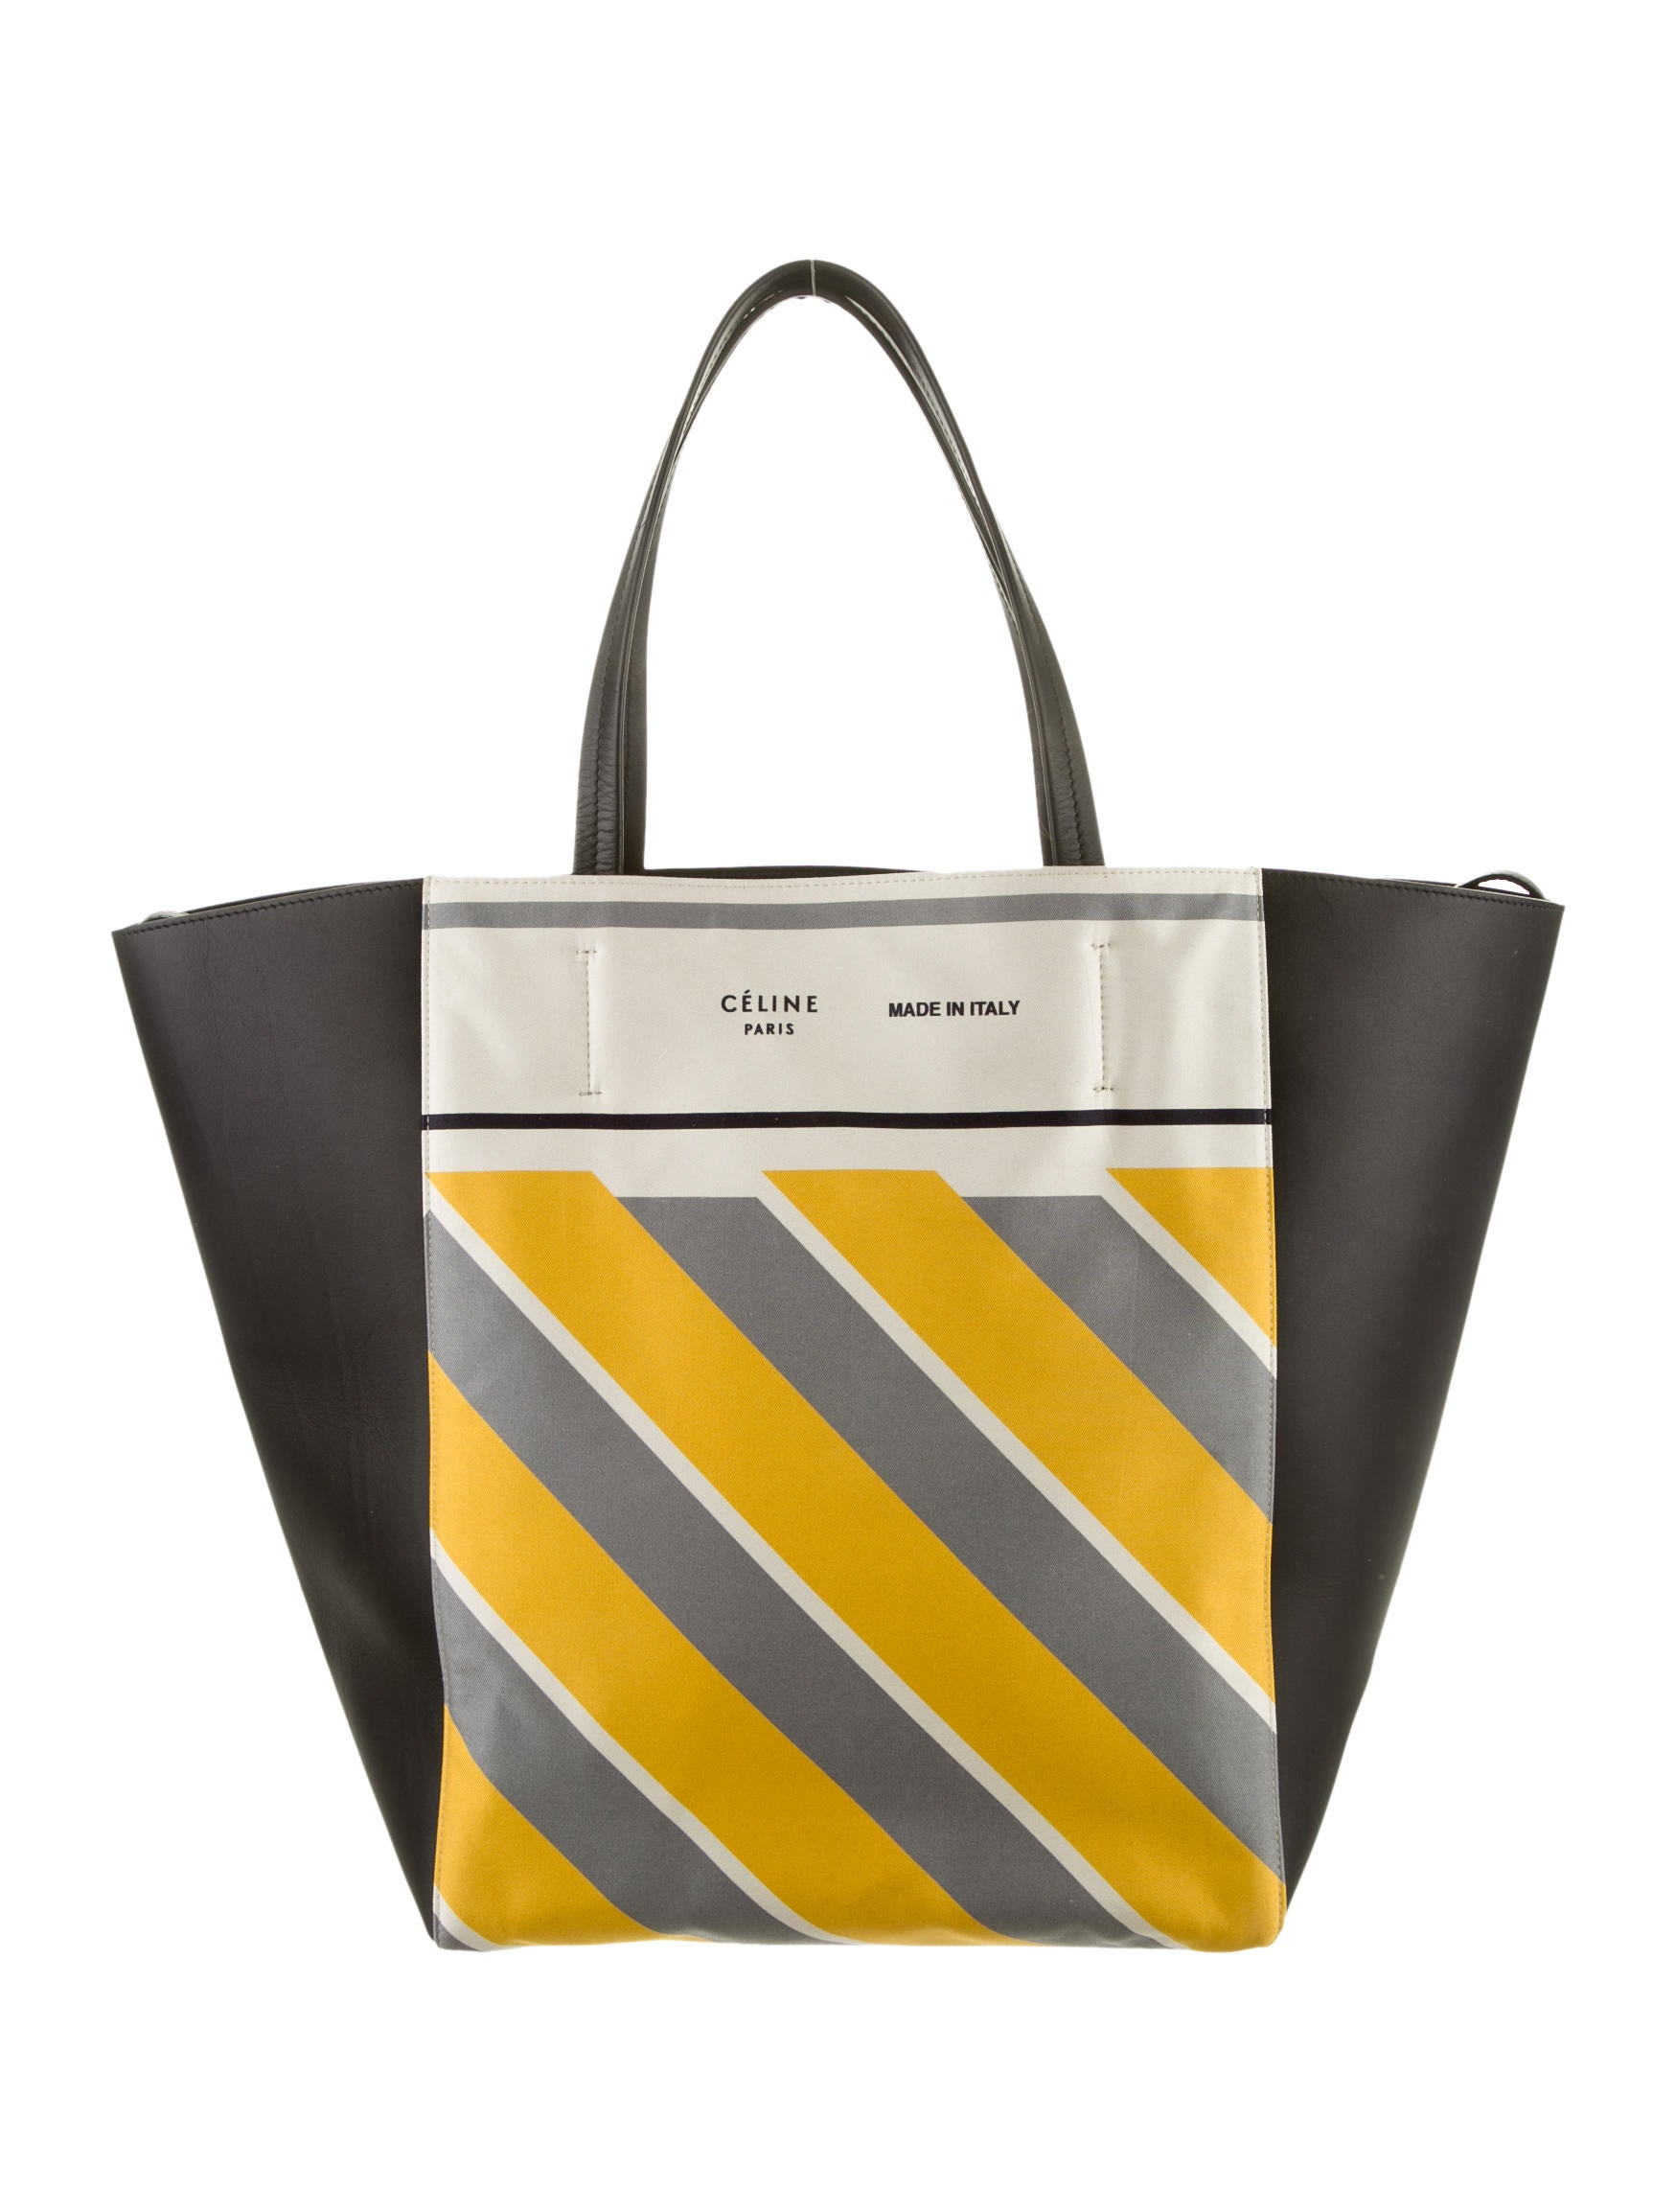 C¨¦line Foulard Cabas Phantom Tote w/ Tags - Handbags - CEL29912 ...